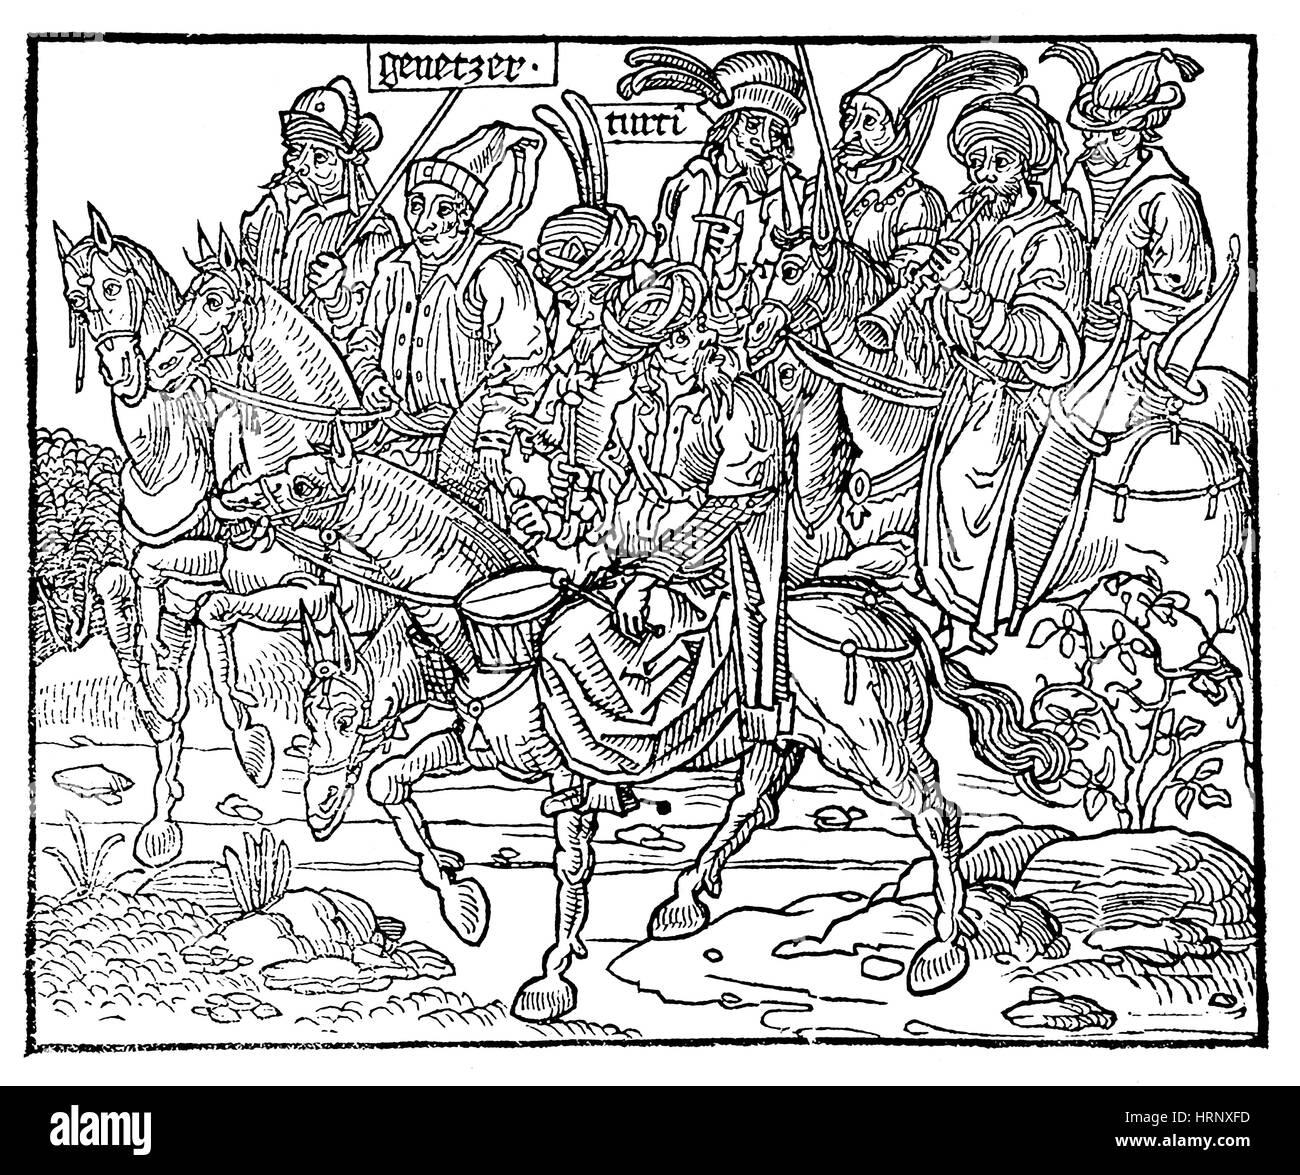 Sanctae Pereginationes, Mounted Turks, 1486 - Stock Image